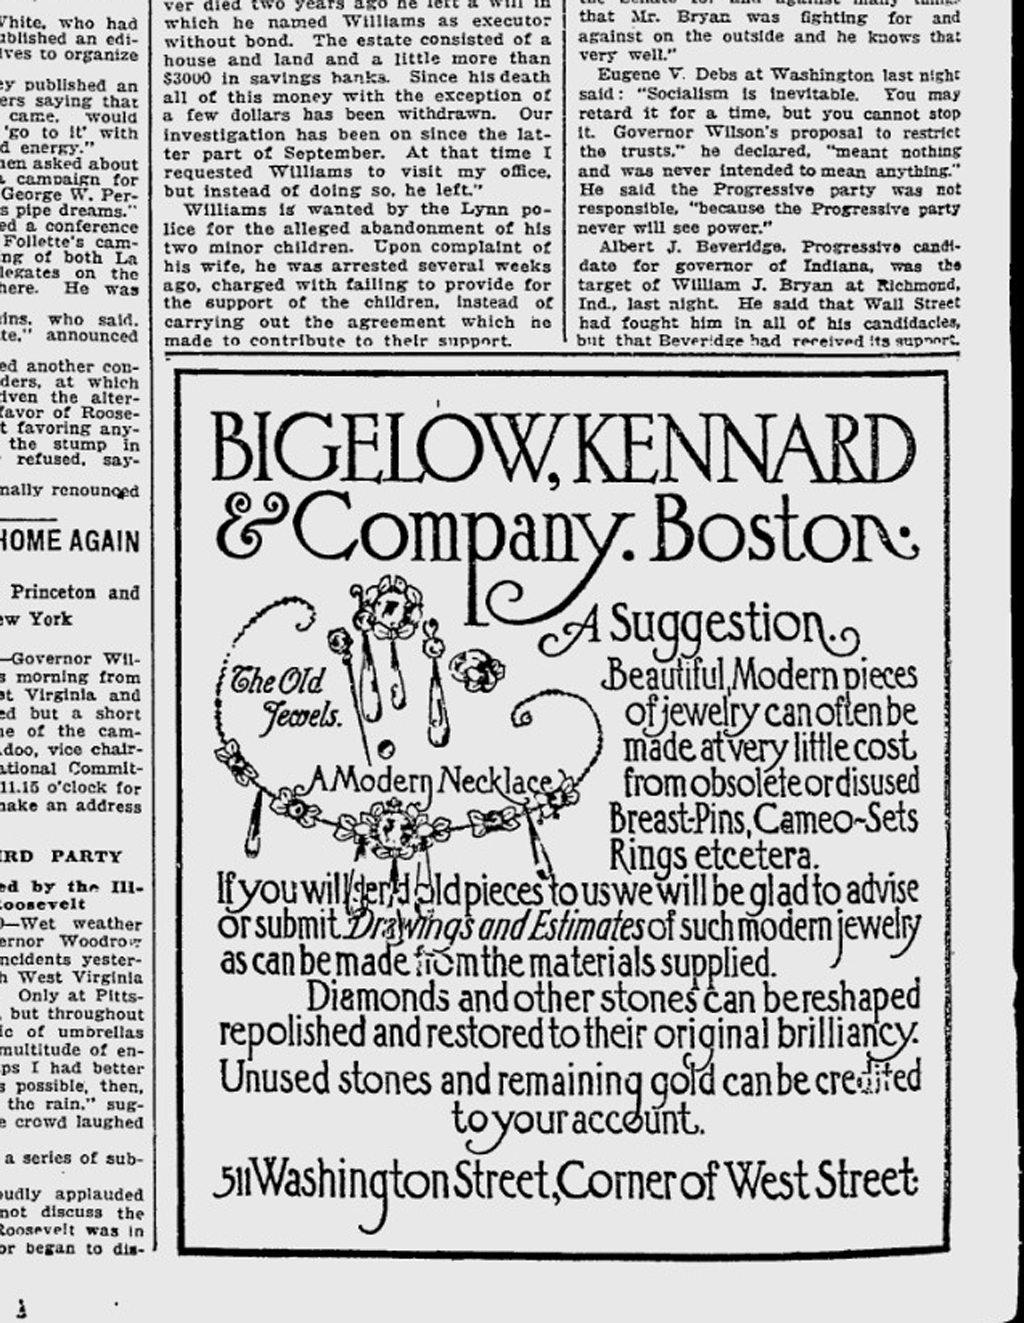 Advertisement for Bigelow, Kennard & Co. in the Boston Evening Transcript, October 12, 1912. Designer unknown.